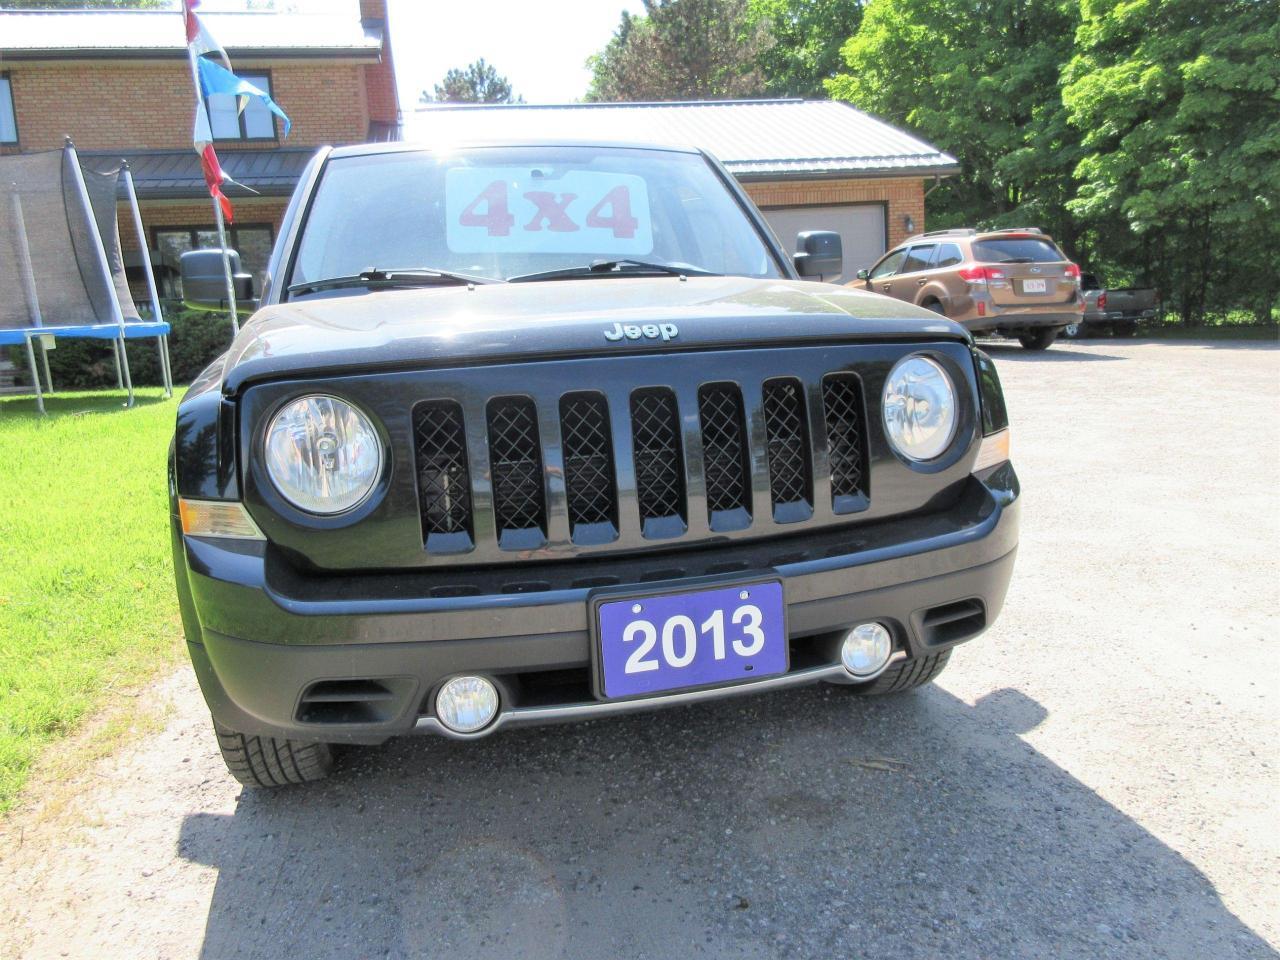 2013 Jeep Patriot